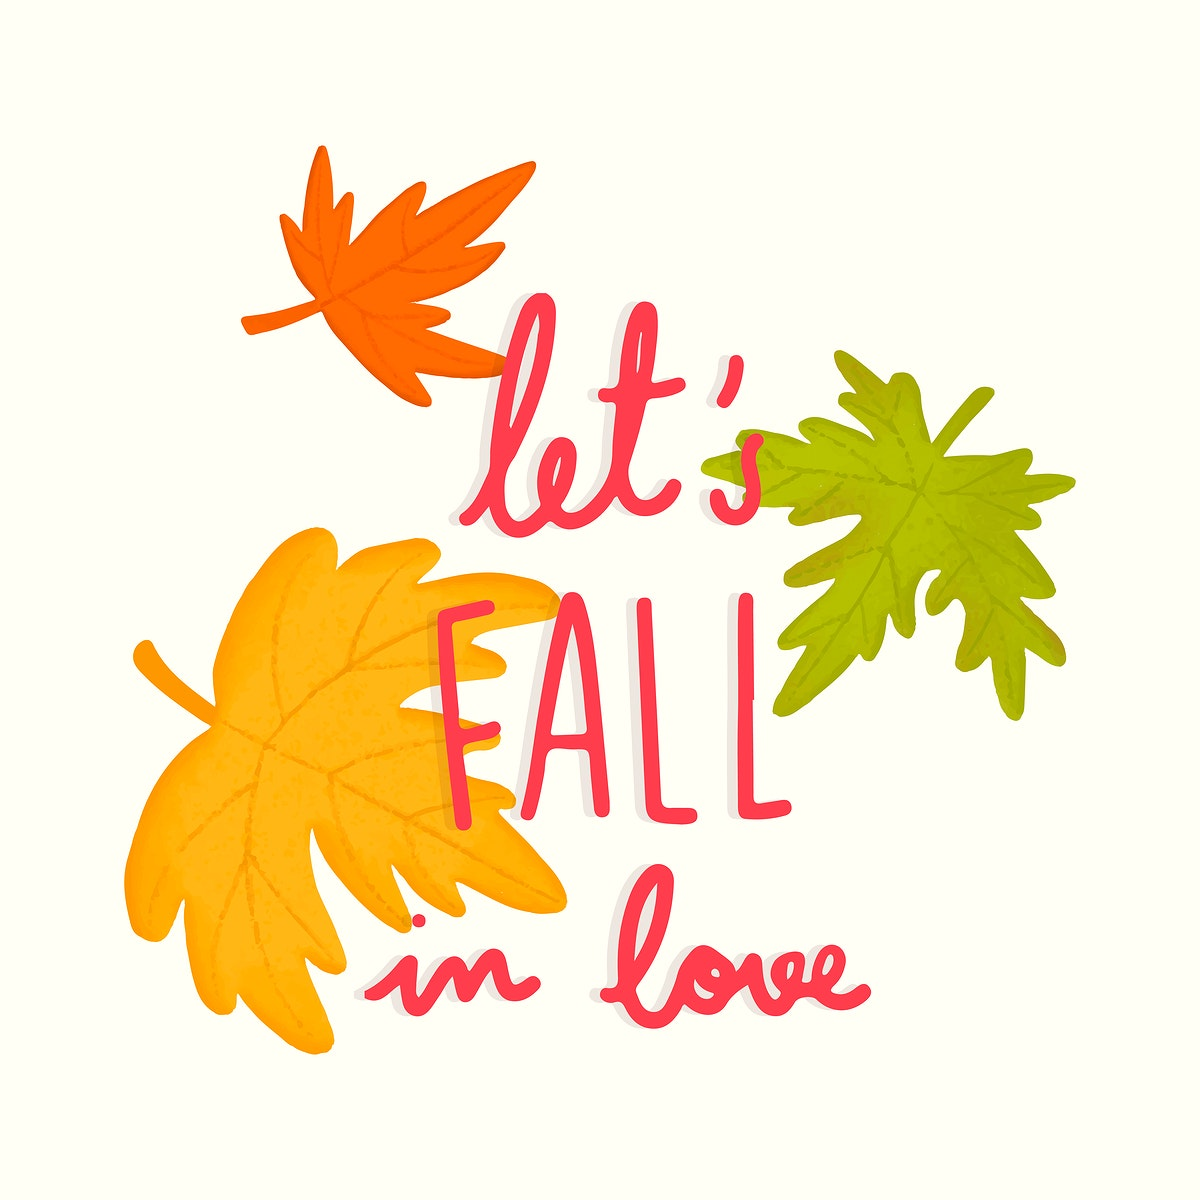 Let's fall in love illustration